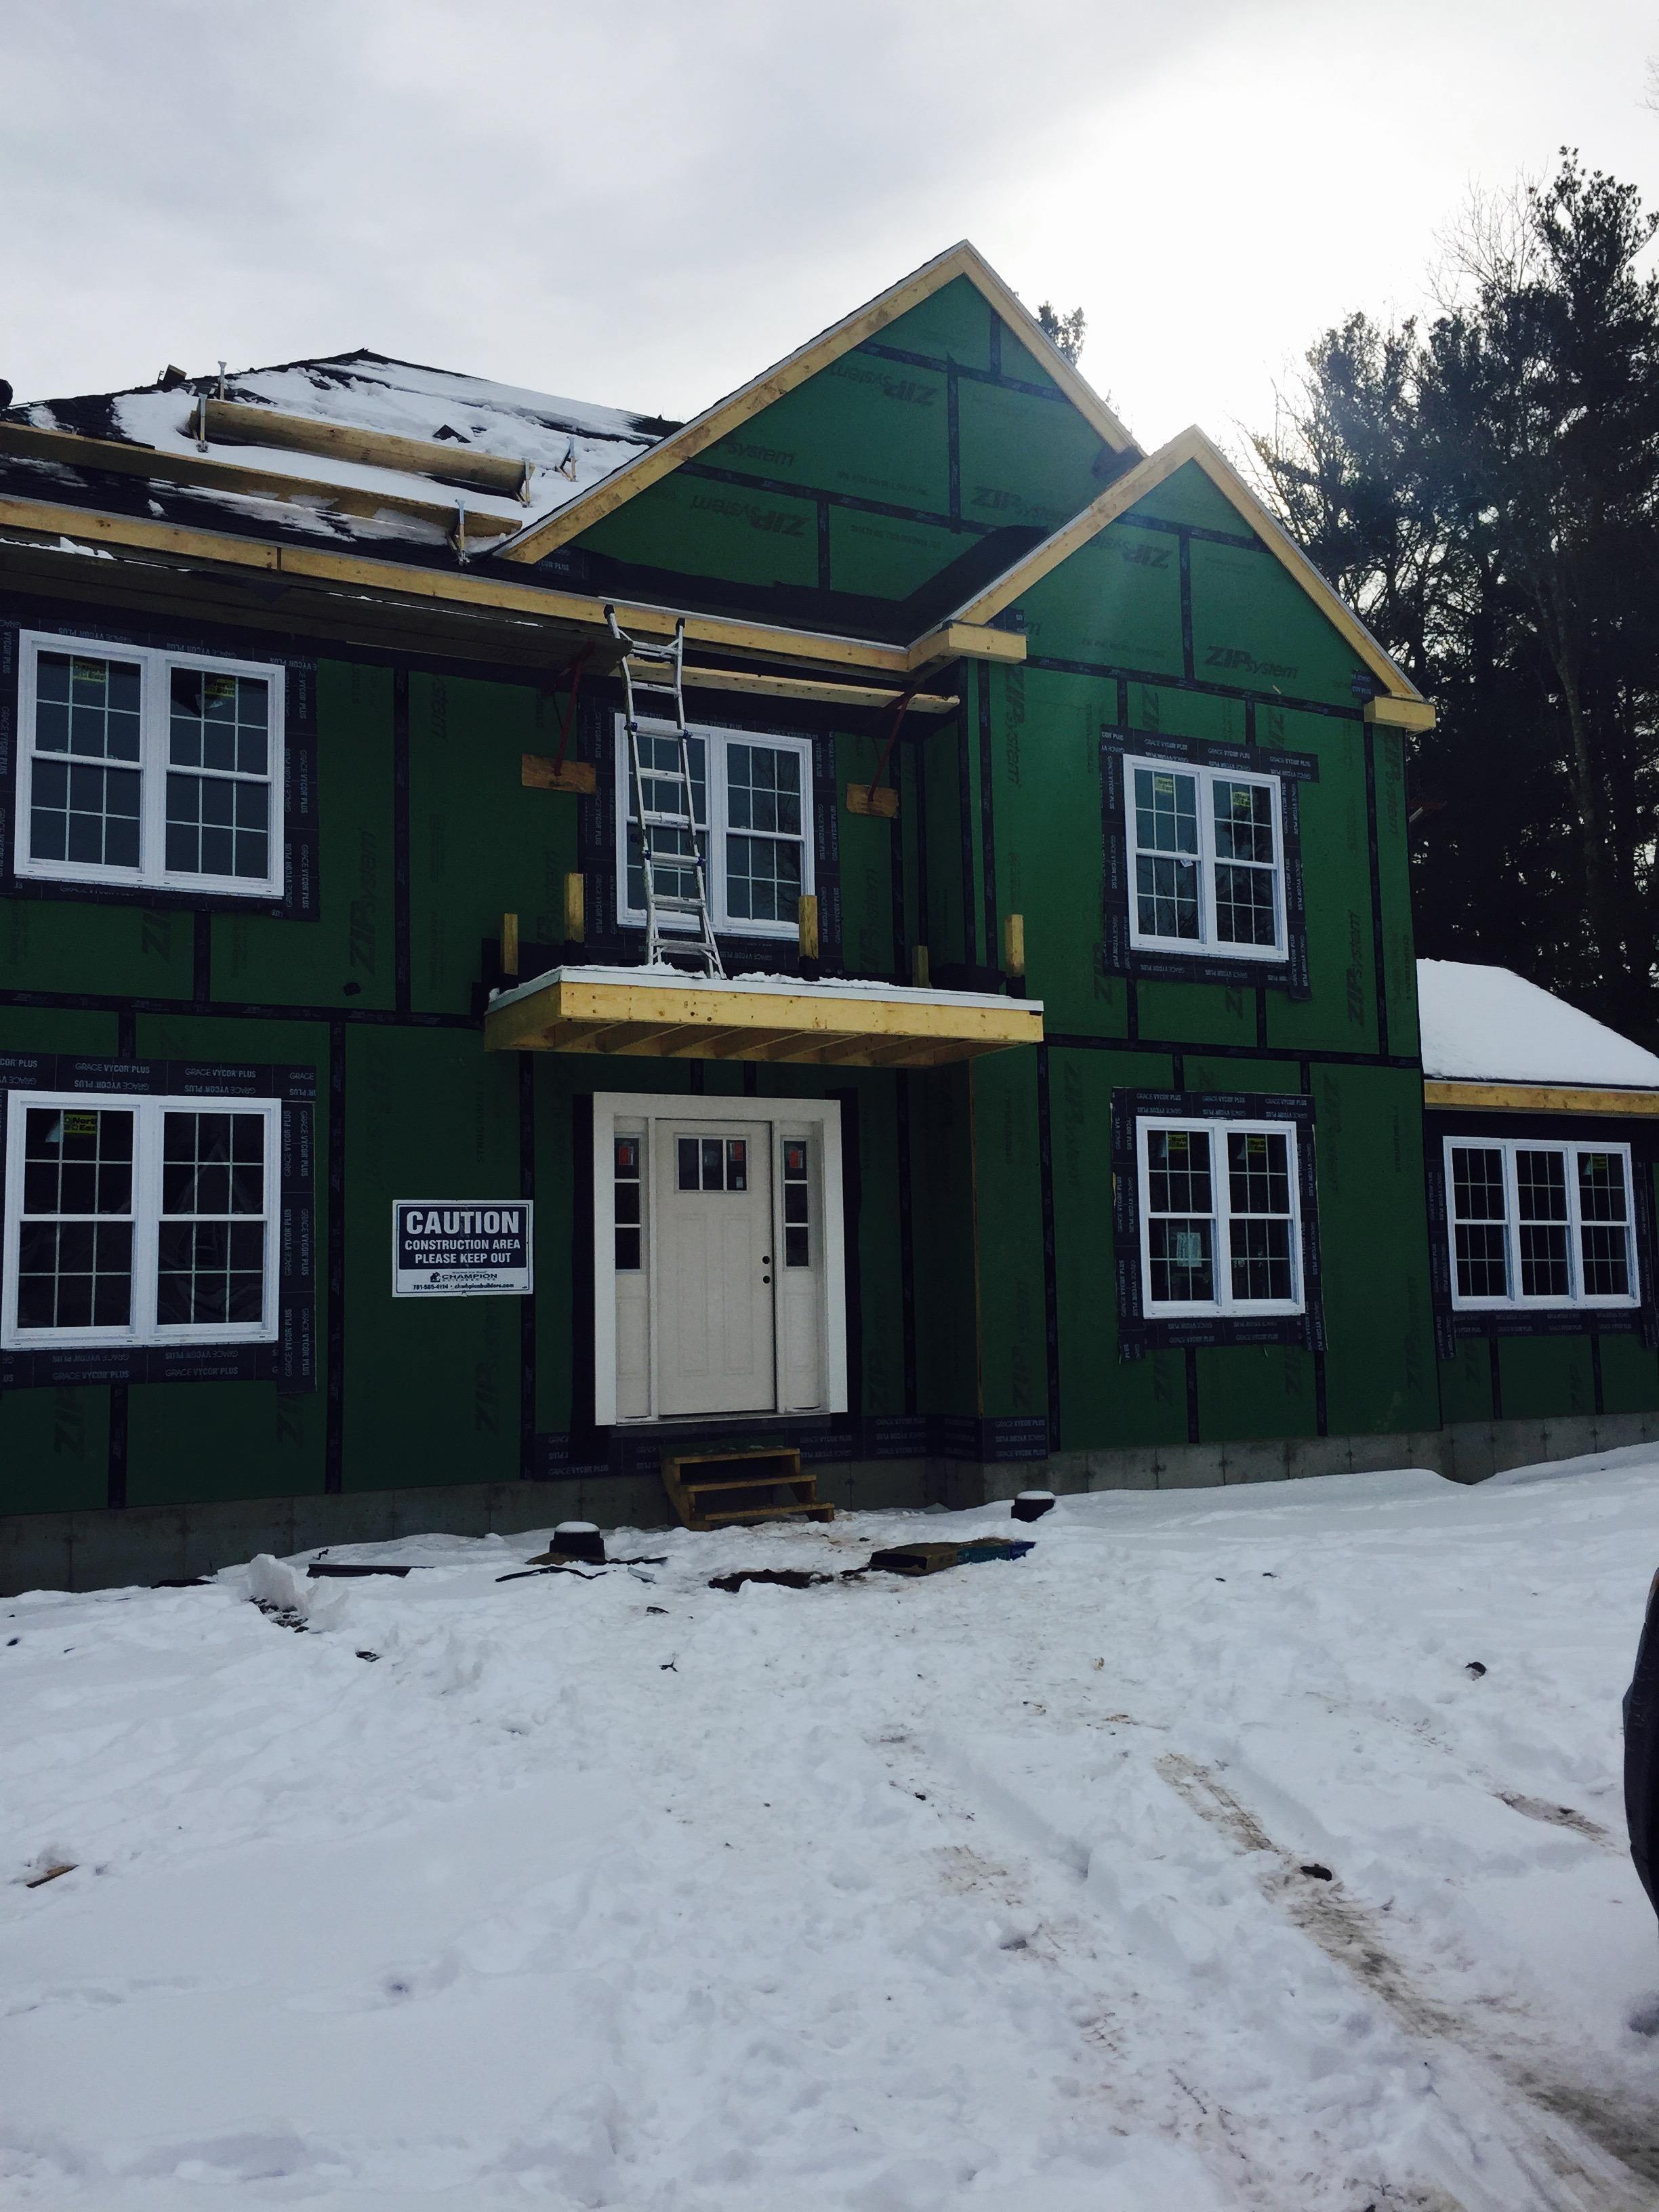 avon house 1-26-16.jpg